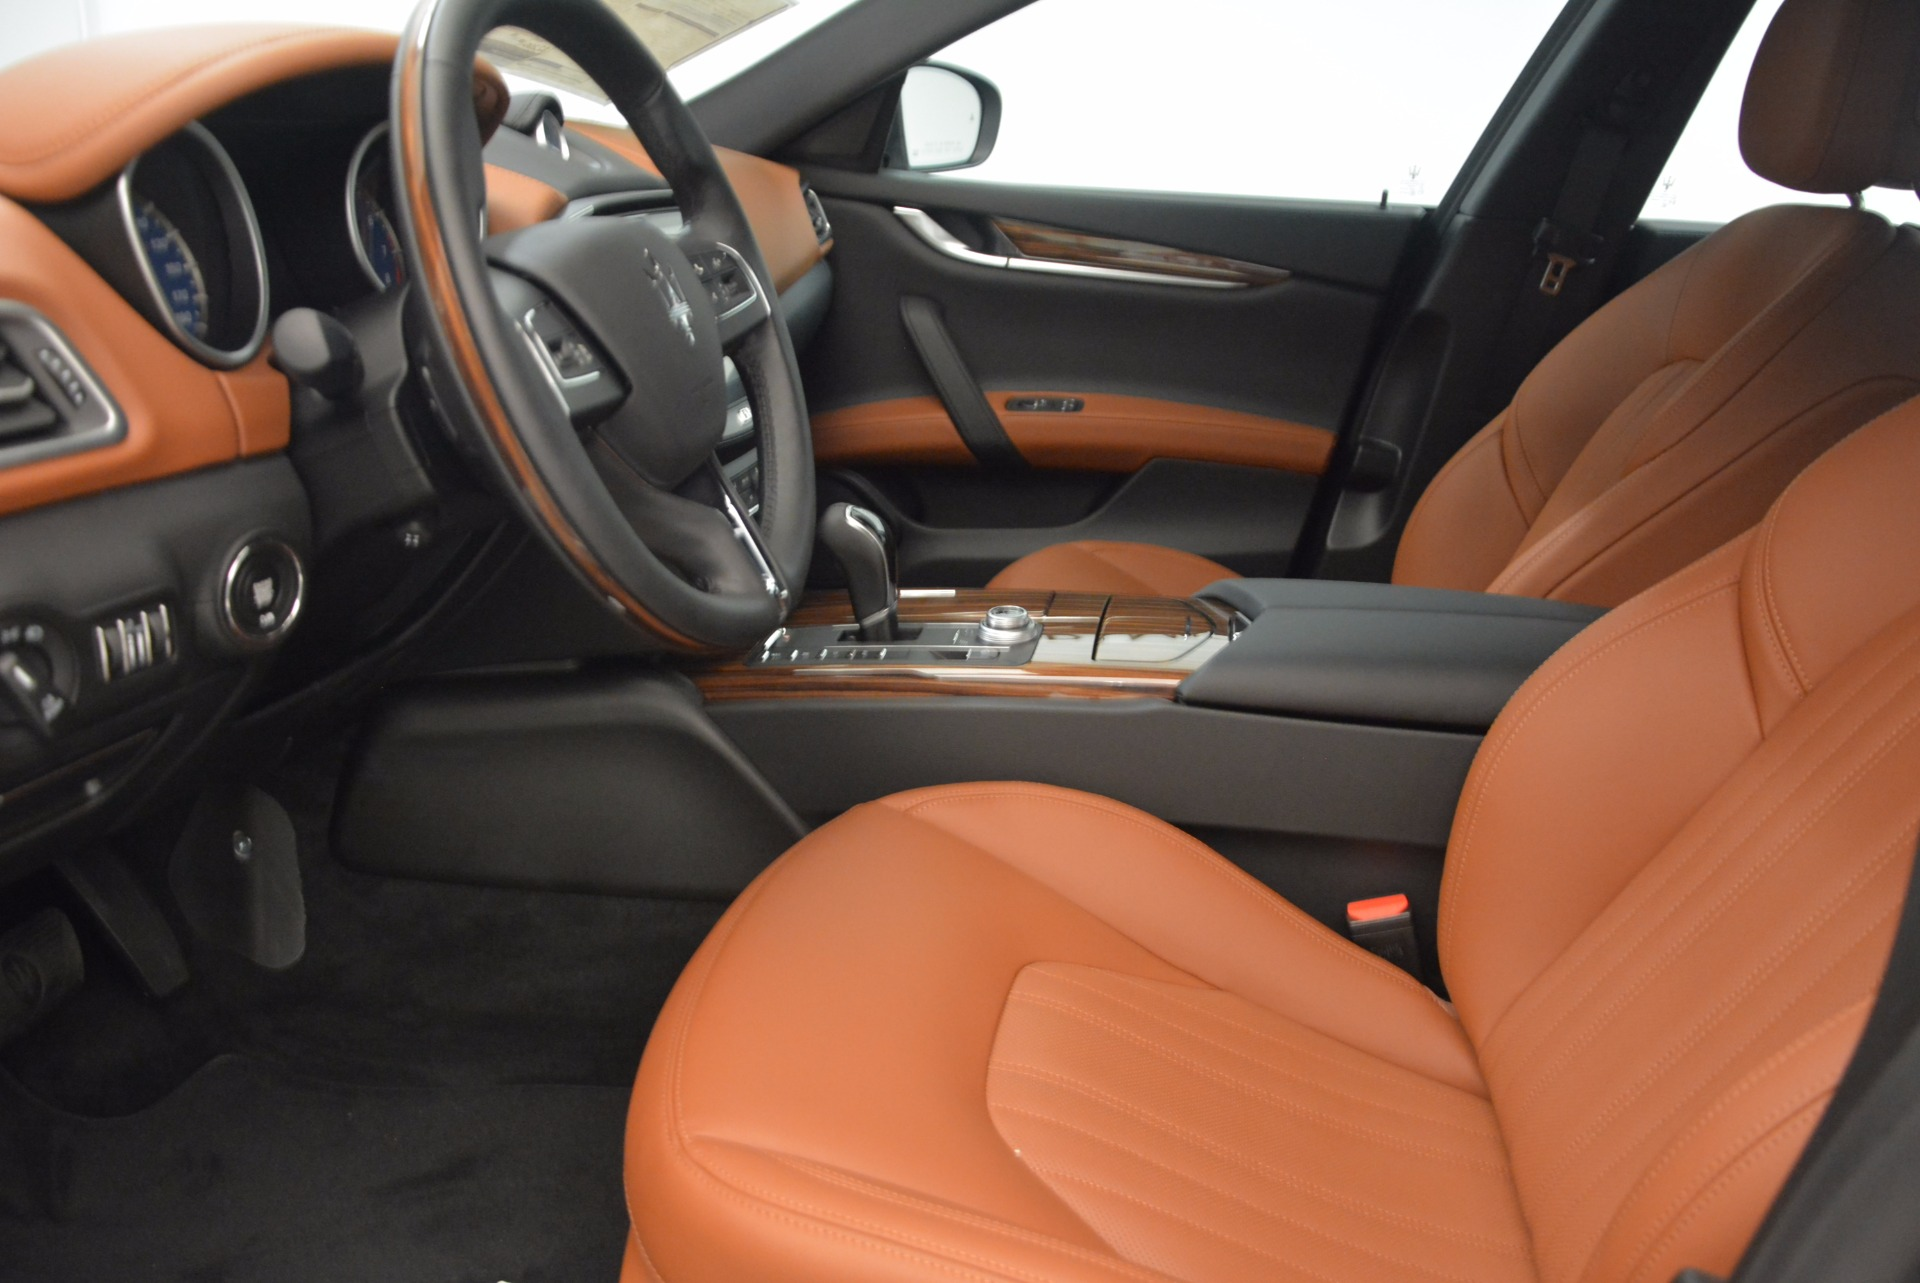 New 2018 Maserati Ghibli S Q4 GranLusso For Sale In Westport, CT 1866_p14